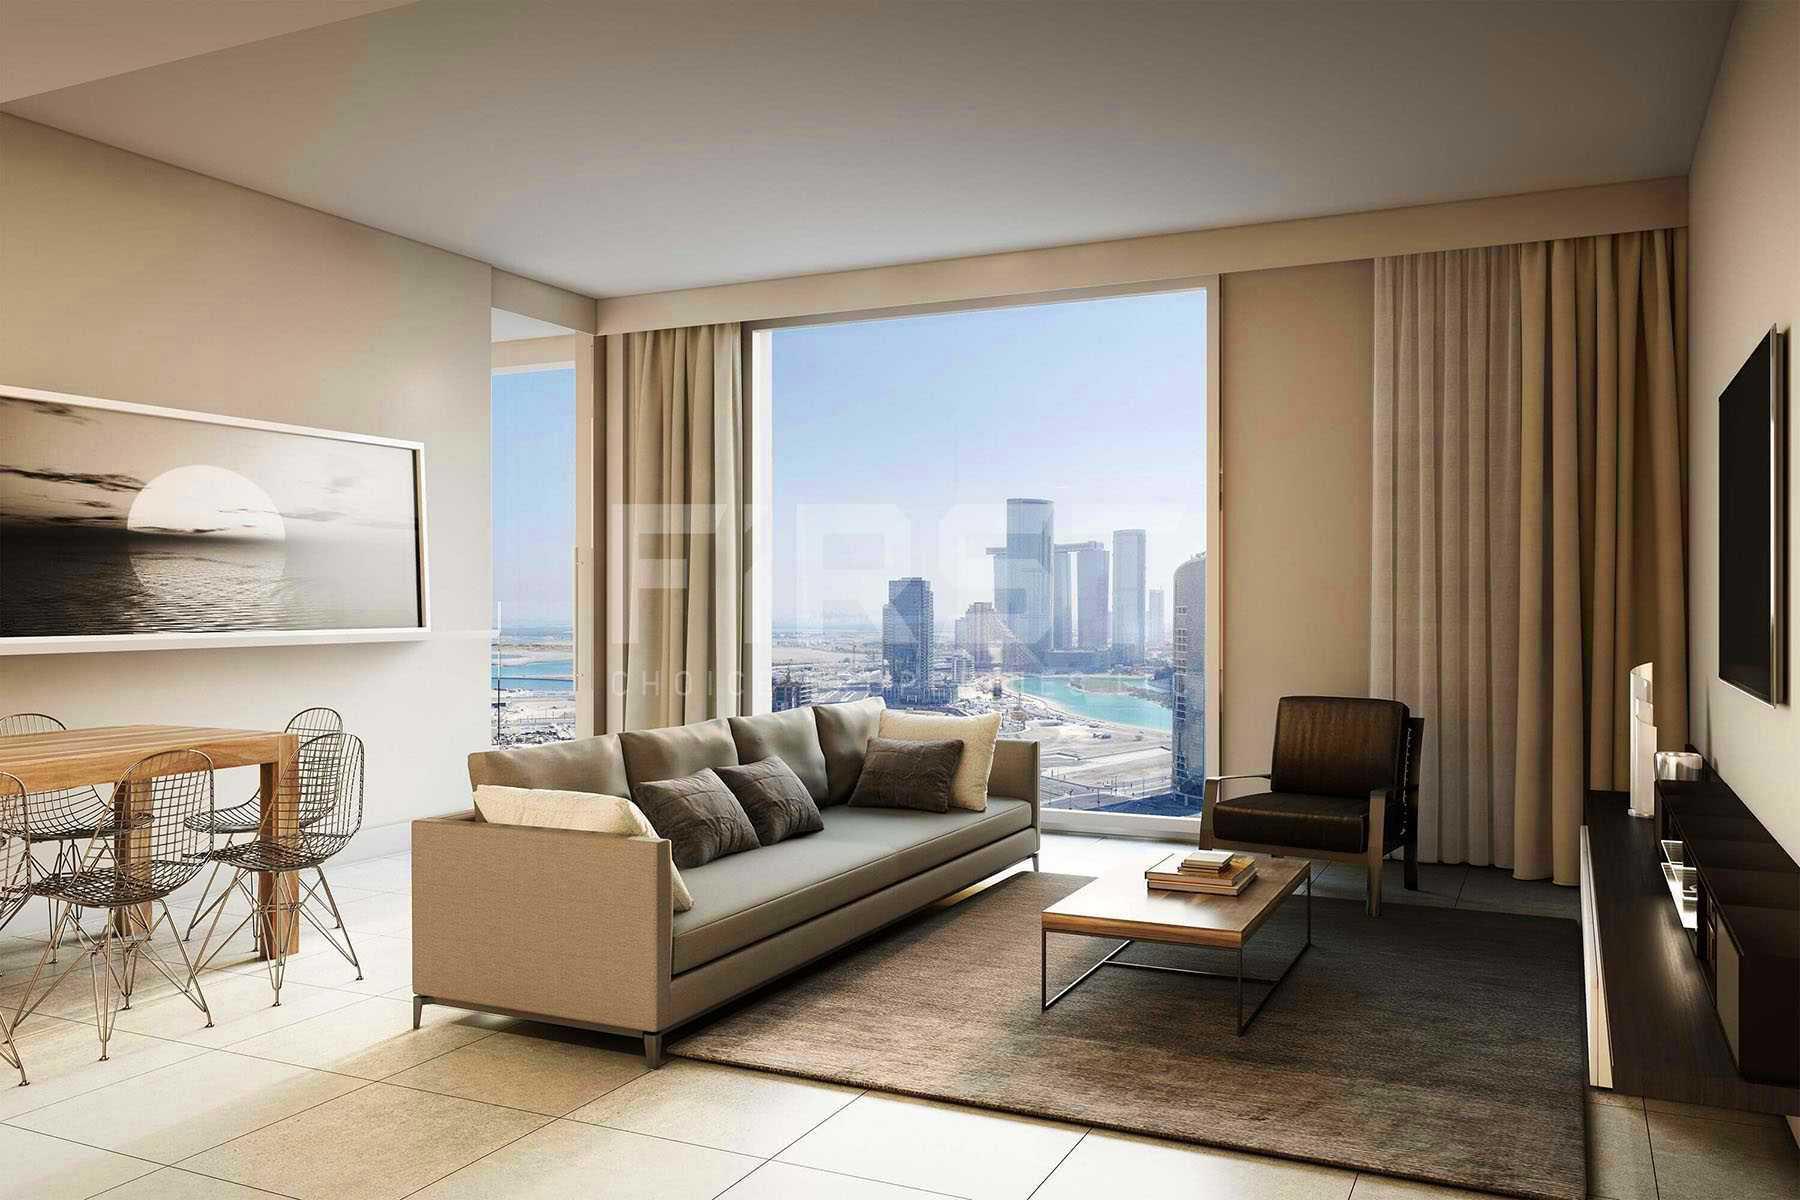 Studio,1 Bedroom, 2 Bedroom, 3 Bedroom,Apartment in The Bridges,Shams Abu Dhabi,Al Reem Island- Abu Dhabi-UAE (3).jpg